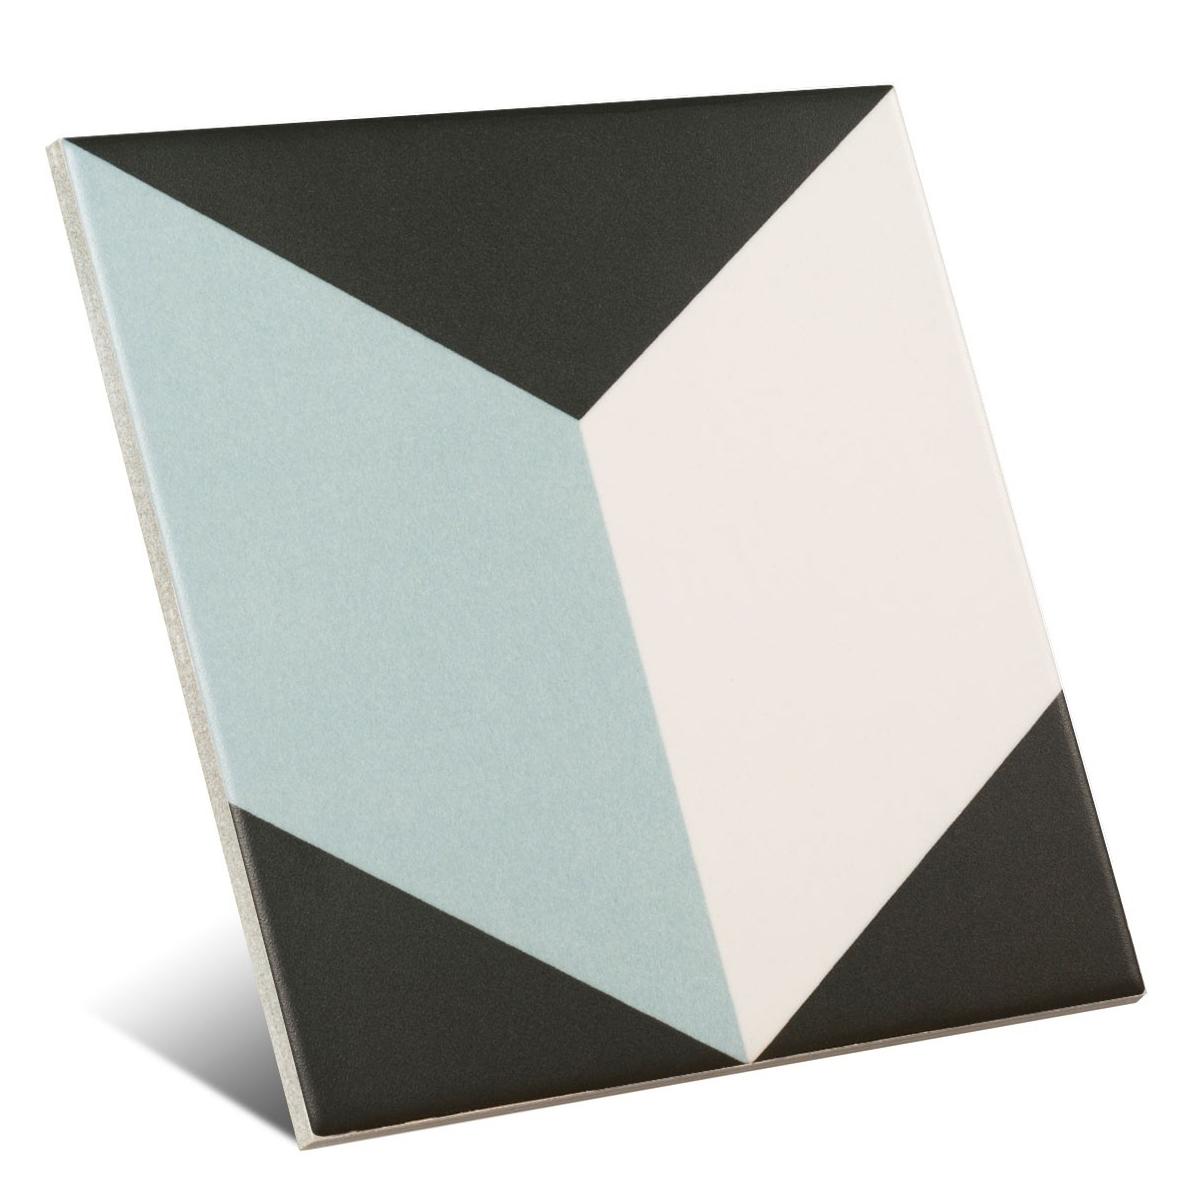 Electra 15x15 (m2) - Serie Rainbow - Marca Pissano